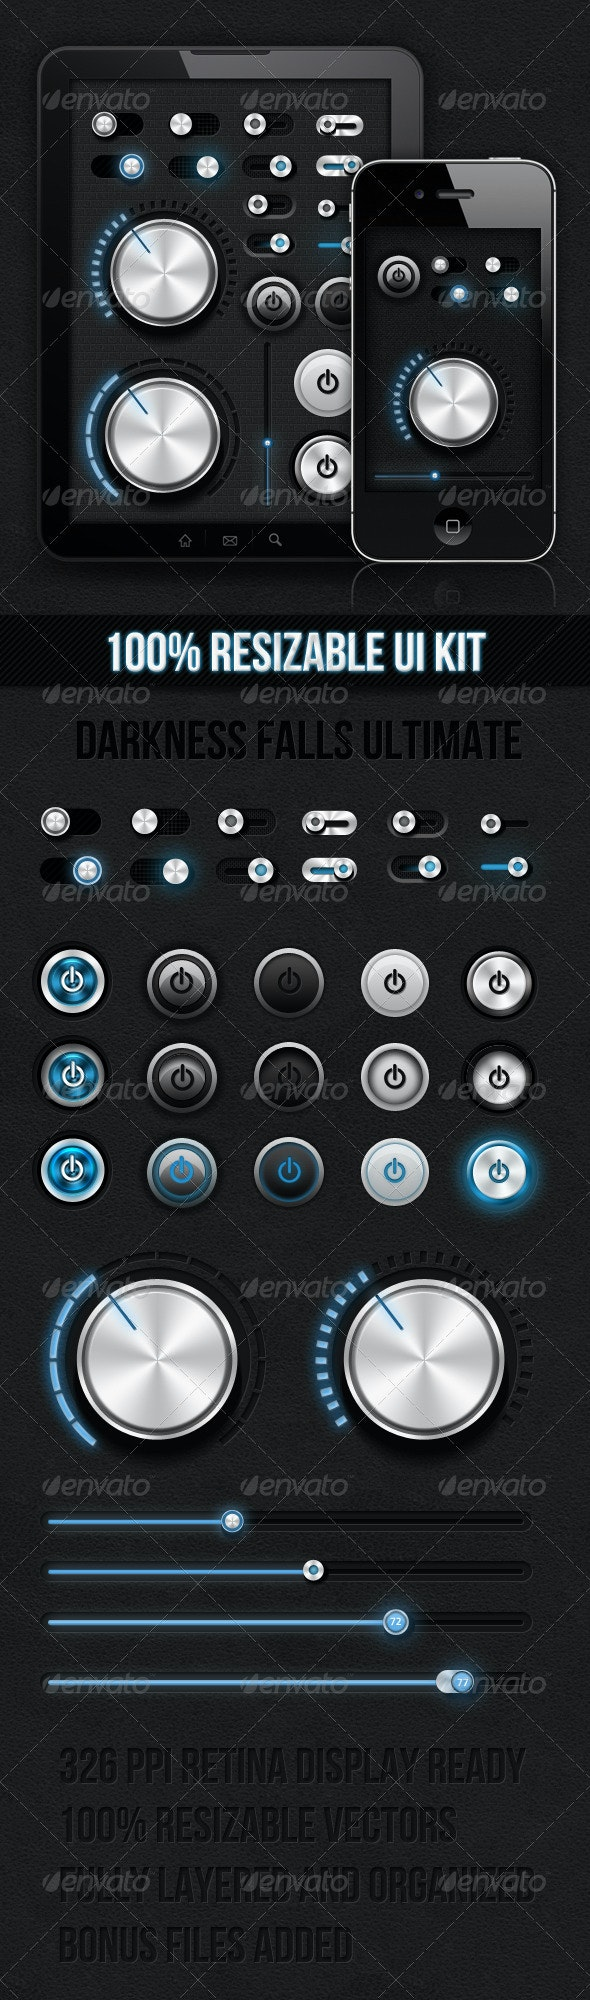 Dark Ui Kit - Darkness Falls Ultimate